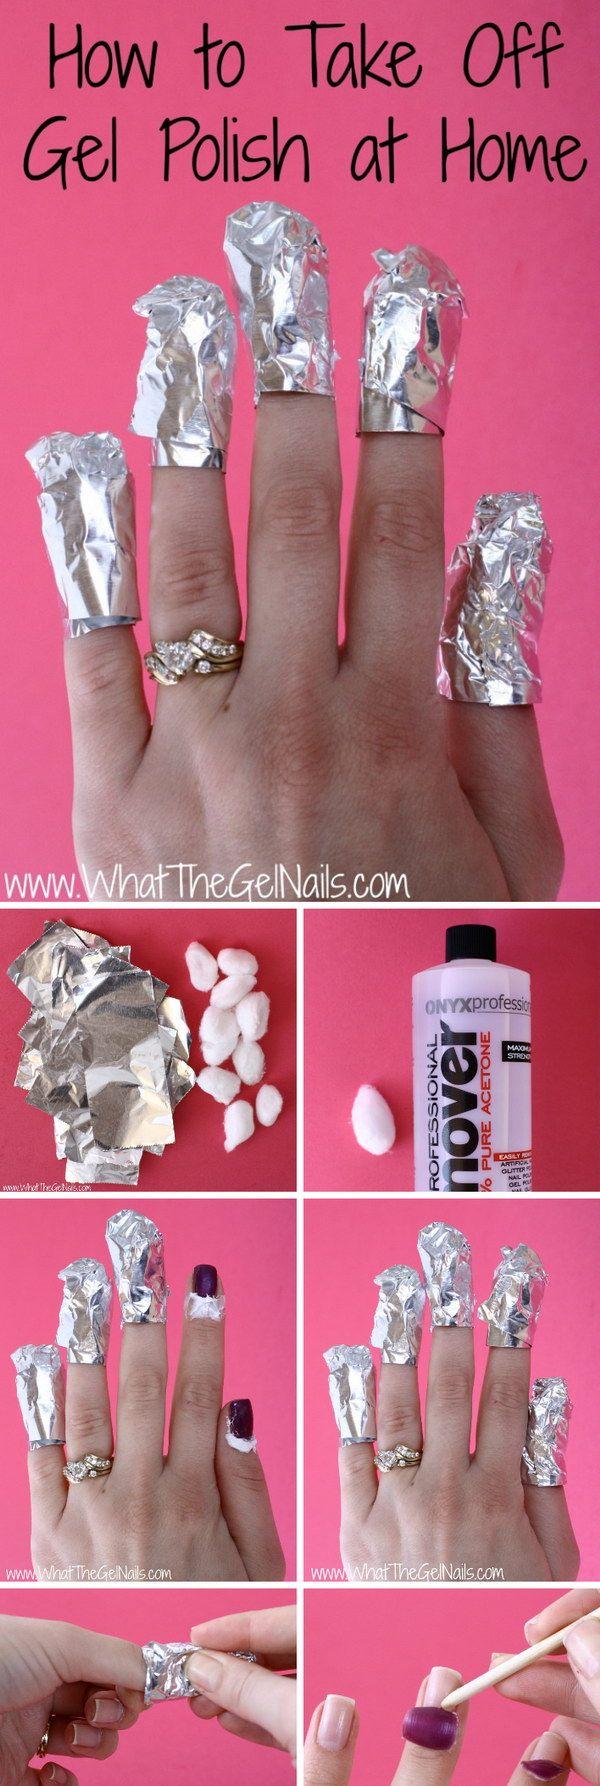 Life-saving Beauty Hacks for Girls | Gel nail polish, Makeup and ...